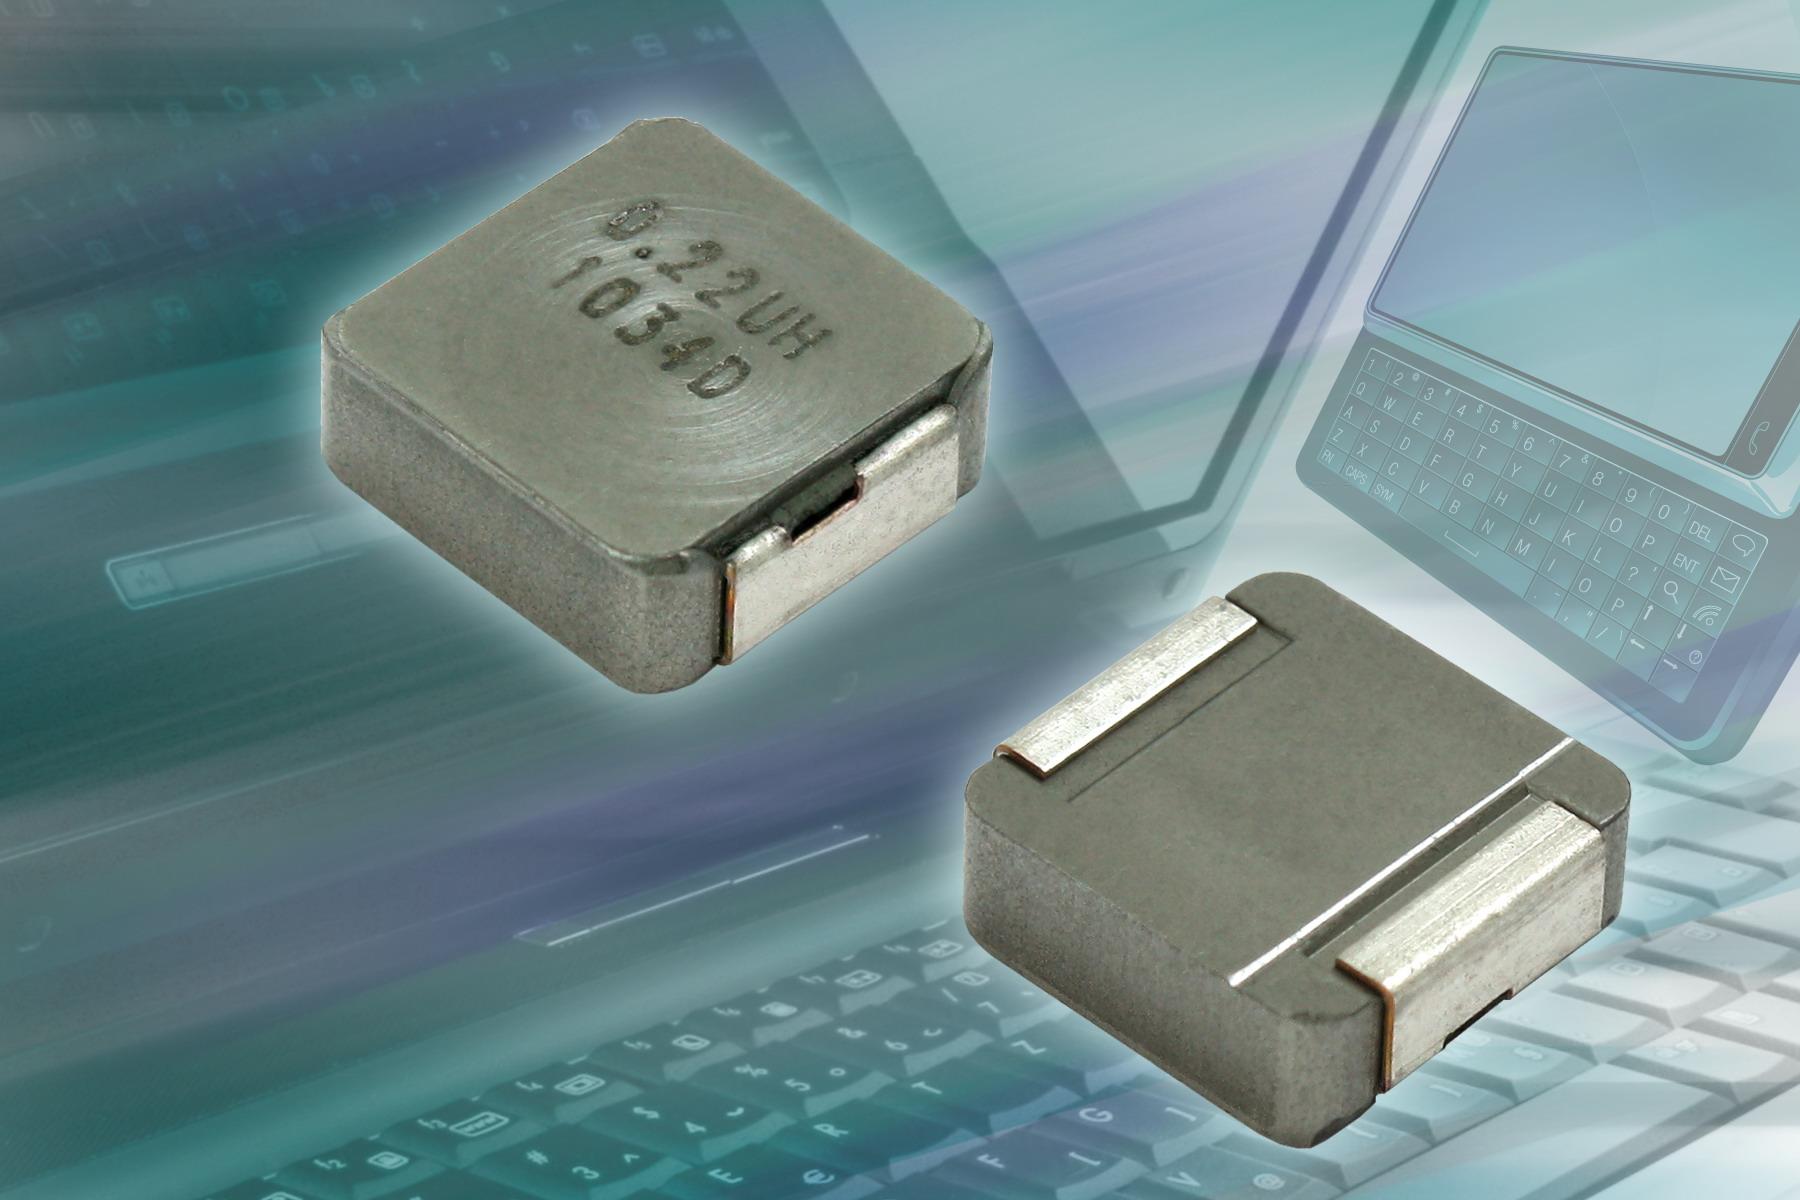 Vishay推出新款超薄IHLP小尺寸、高电流电感器